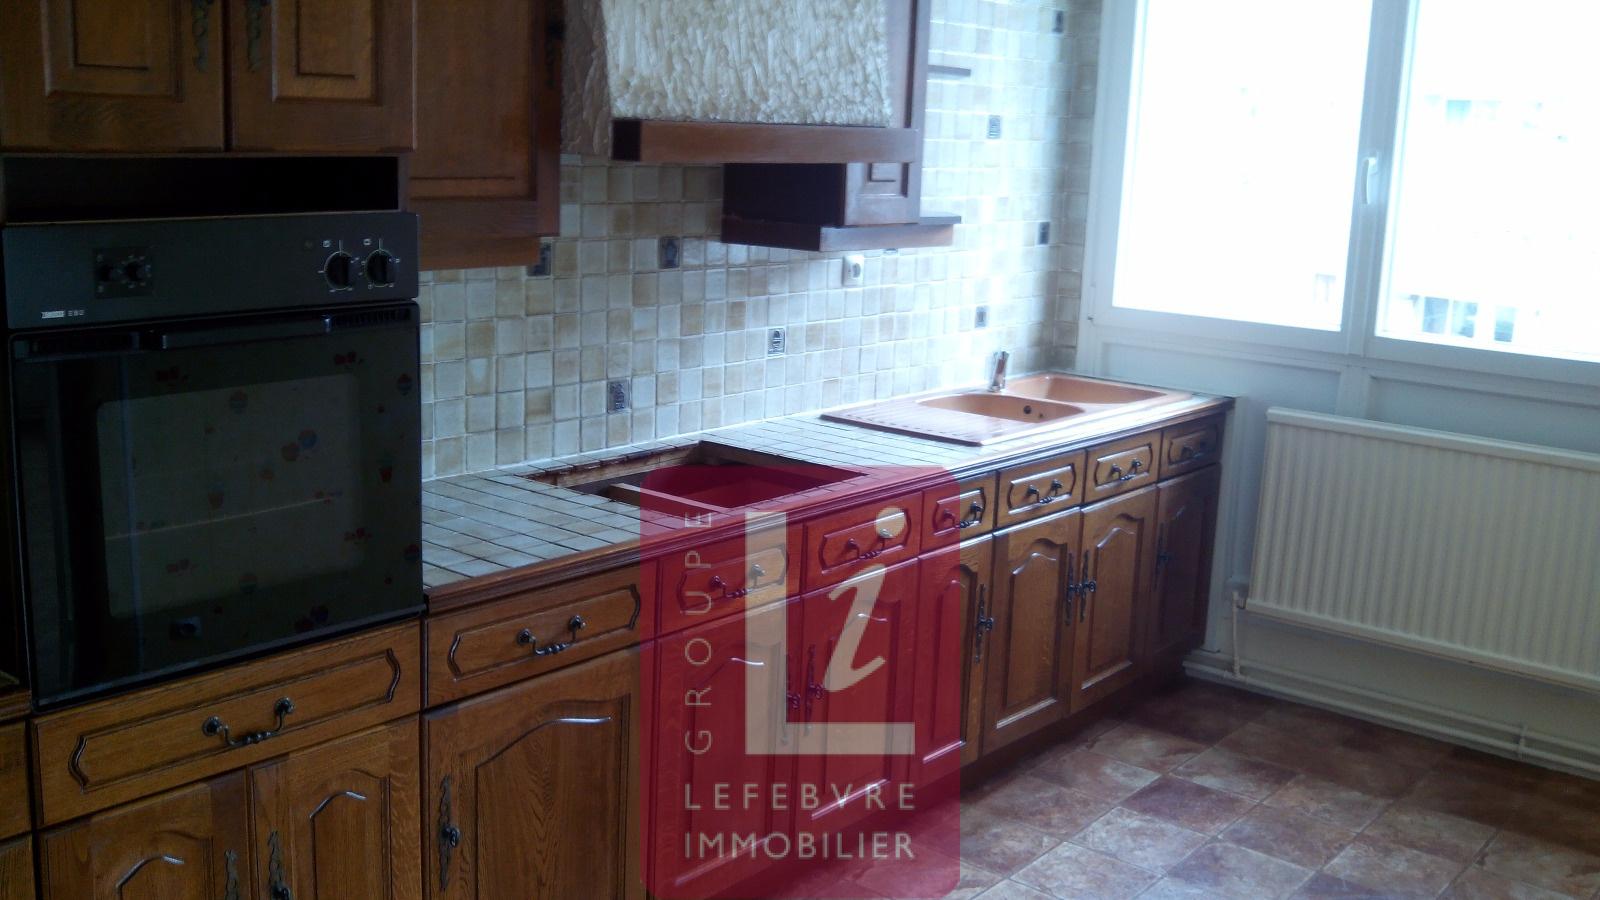 location mas088 appartement 2 chambres cuisine quip e. Black Bedroom Furniture Sets. Home Design Ideas